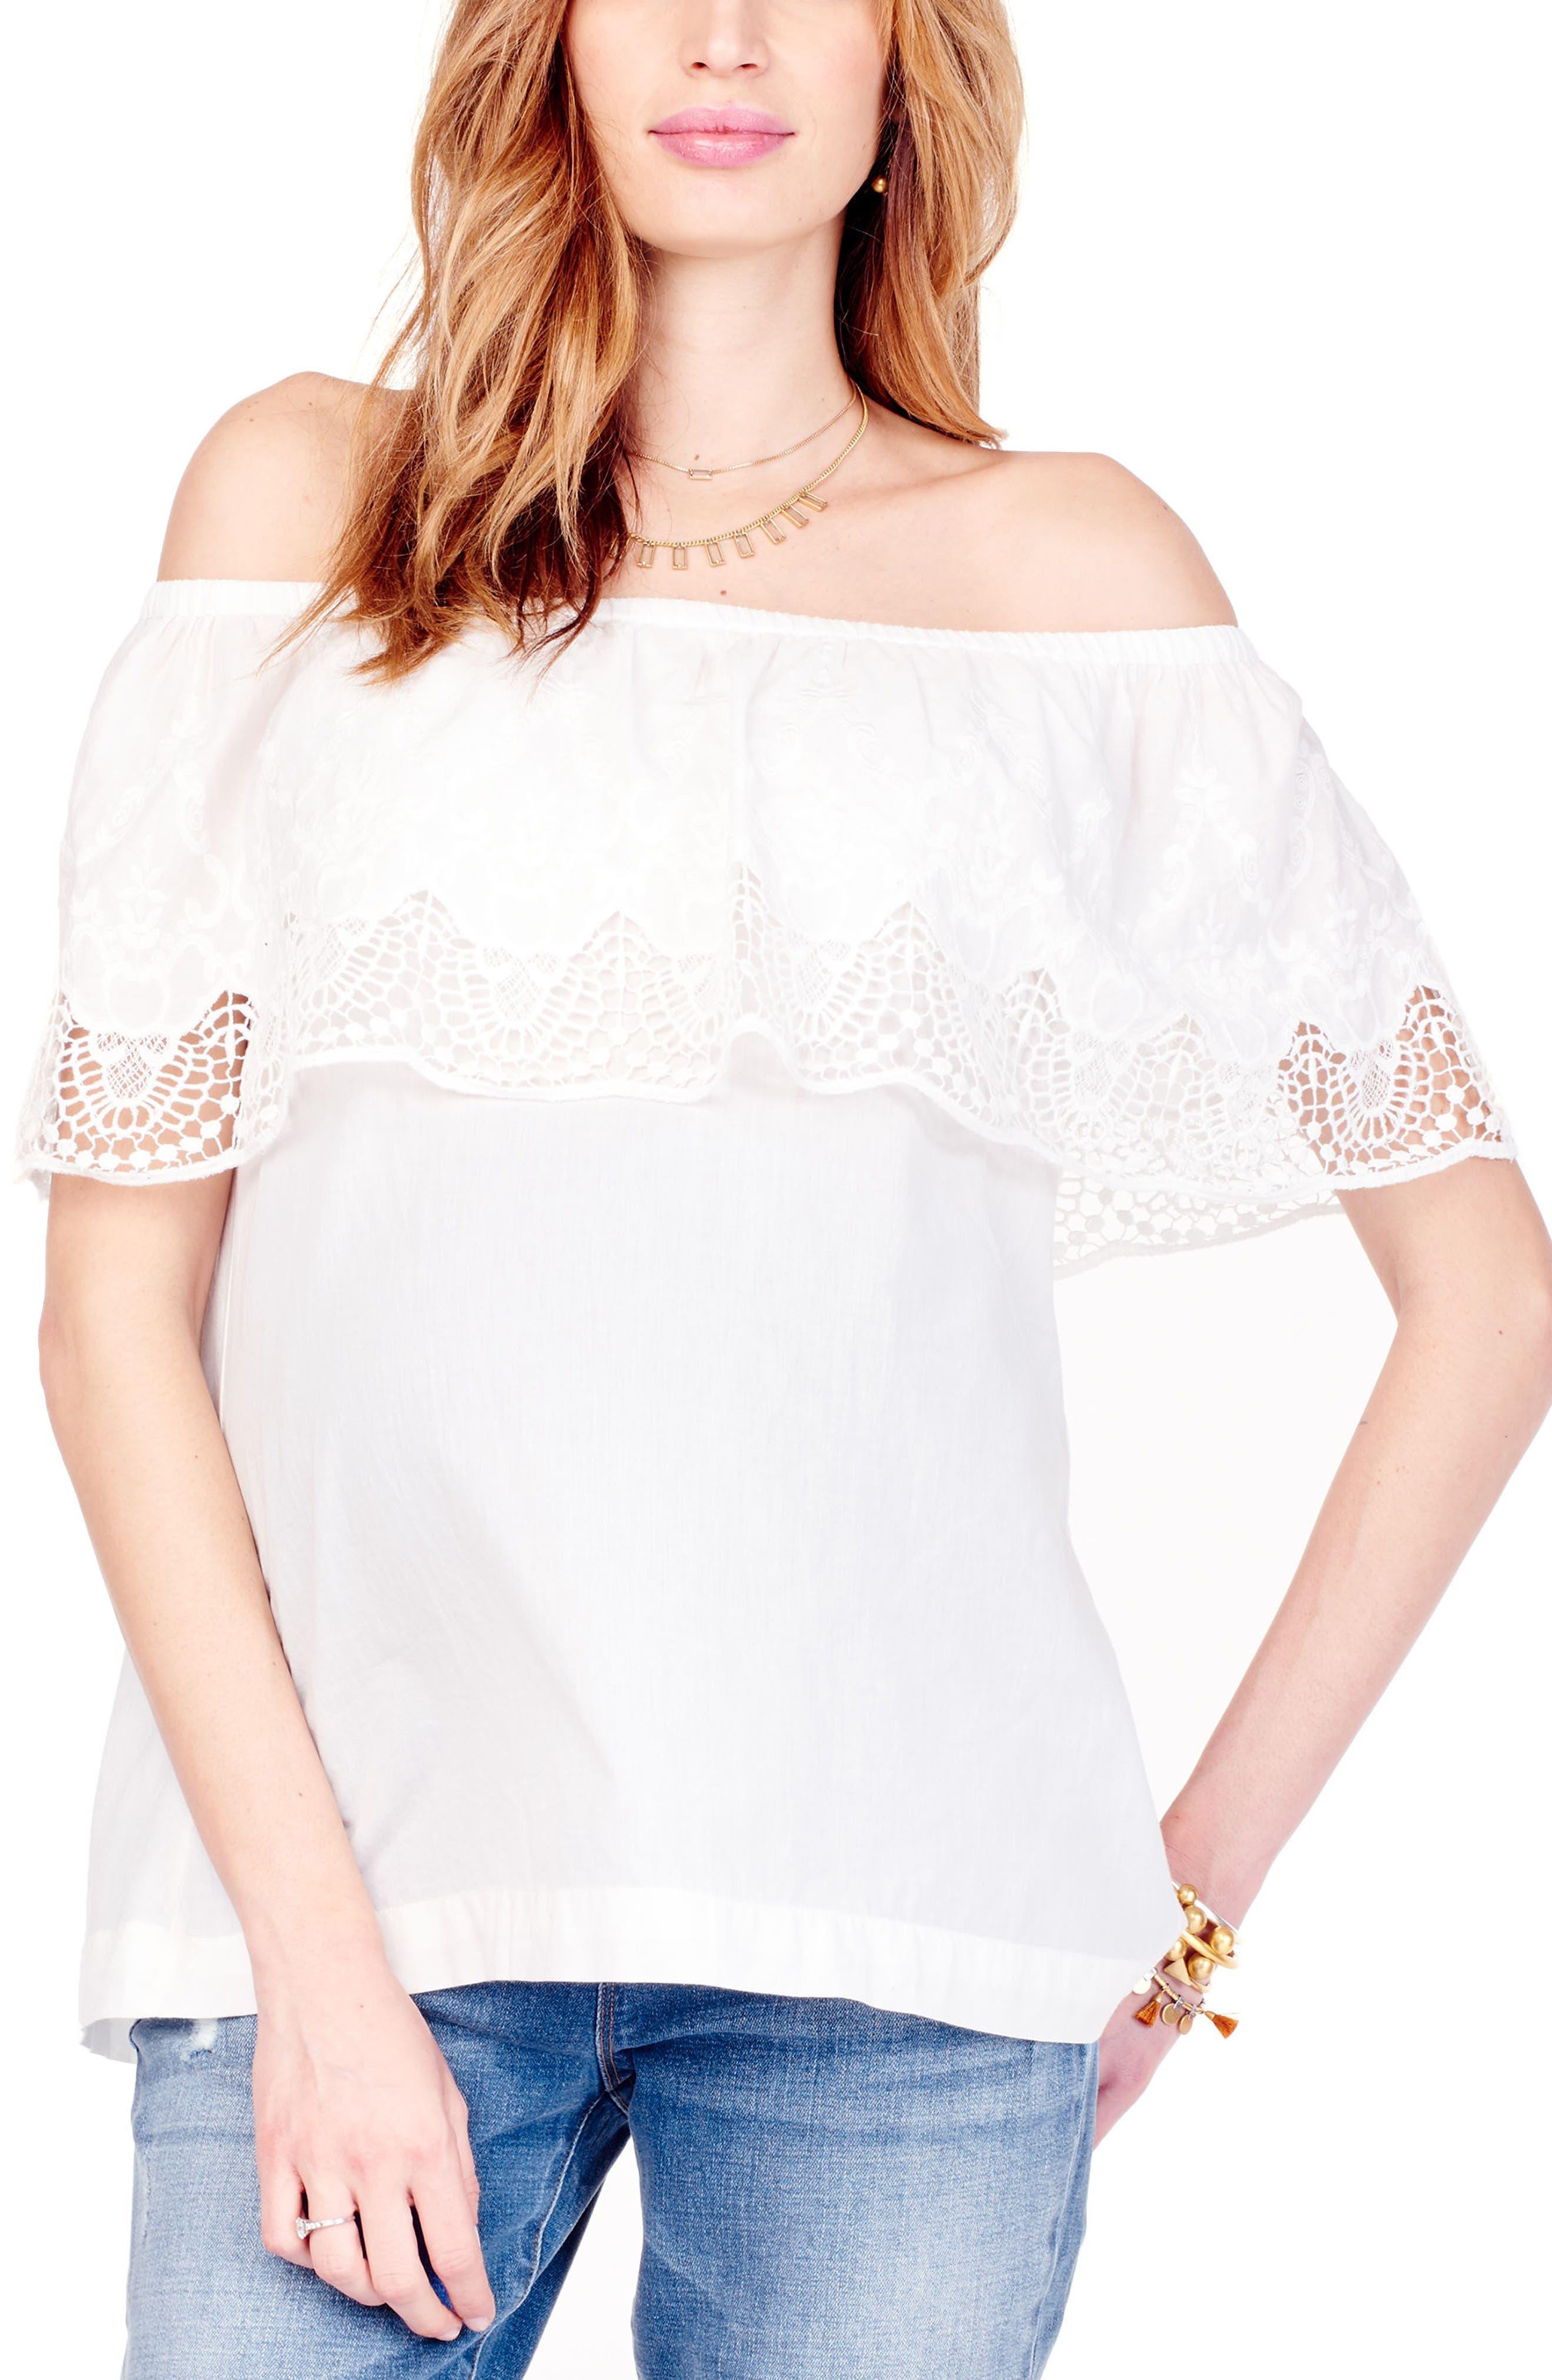 Alternate Image 1 Selected - Ingrid & Isabel® Lace Off the Shoulder Maternity Top